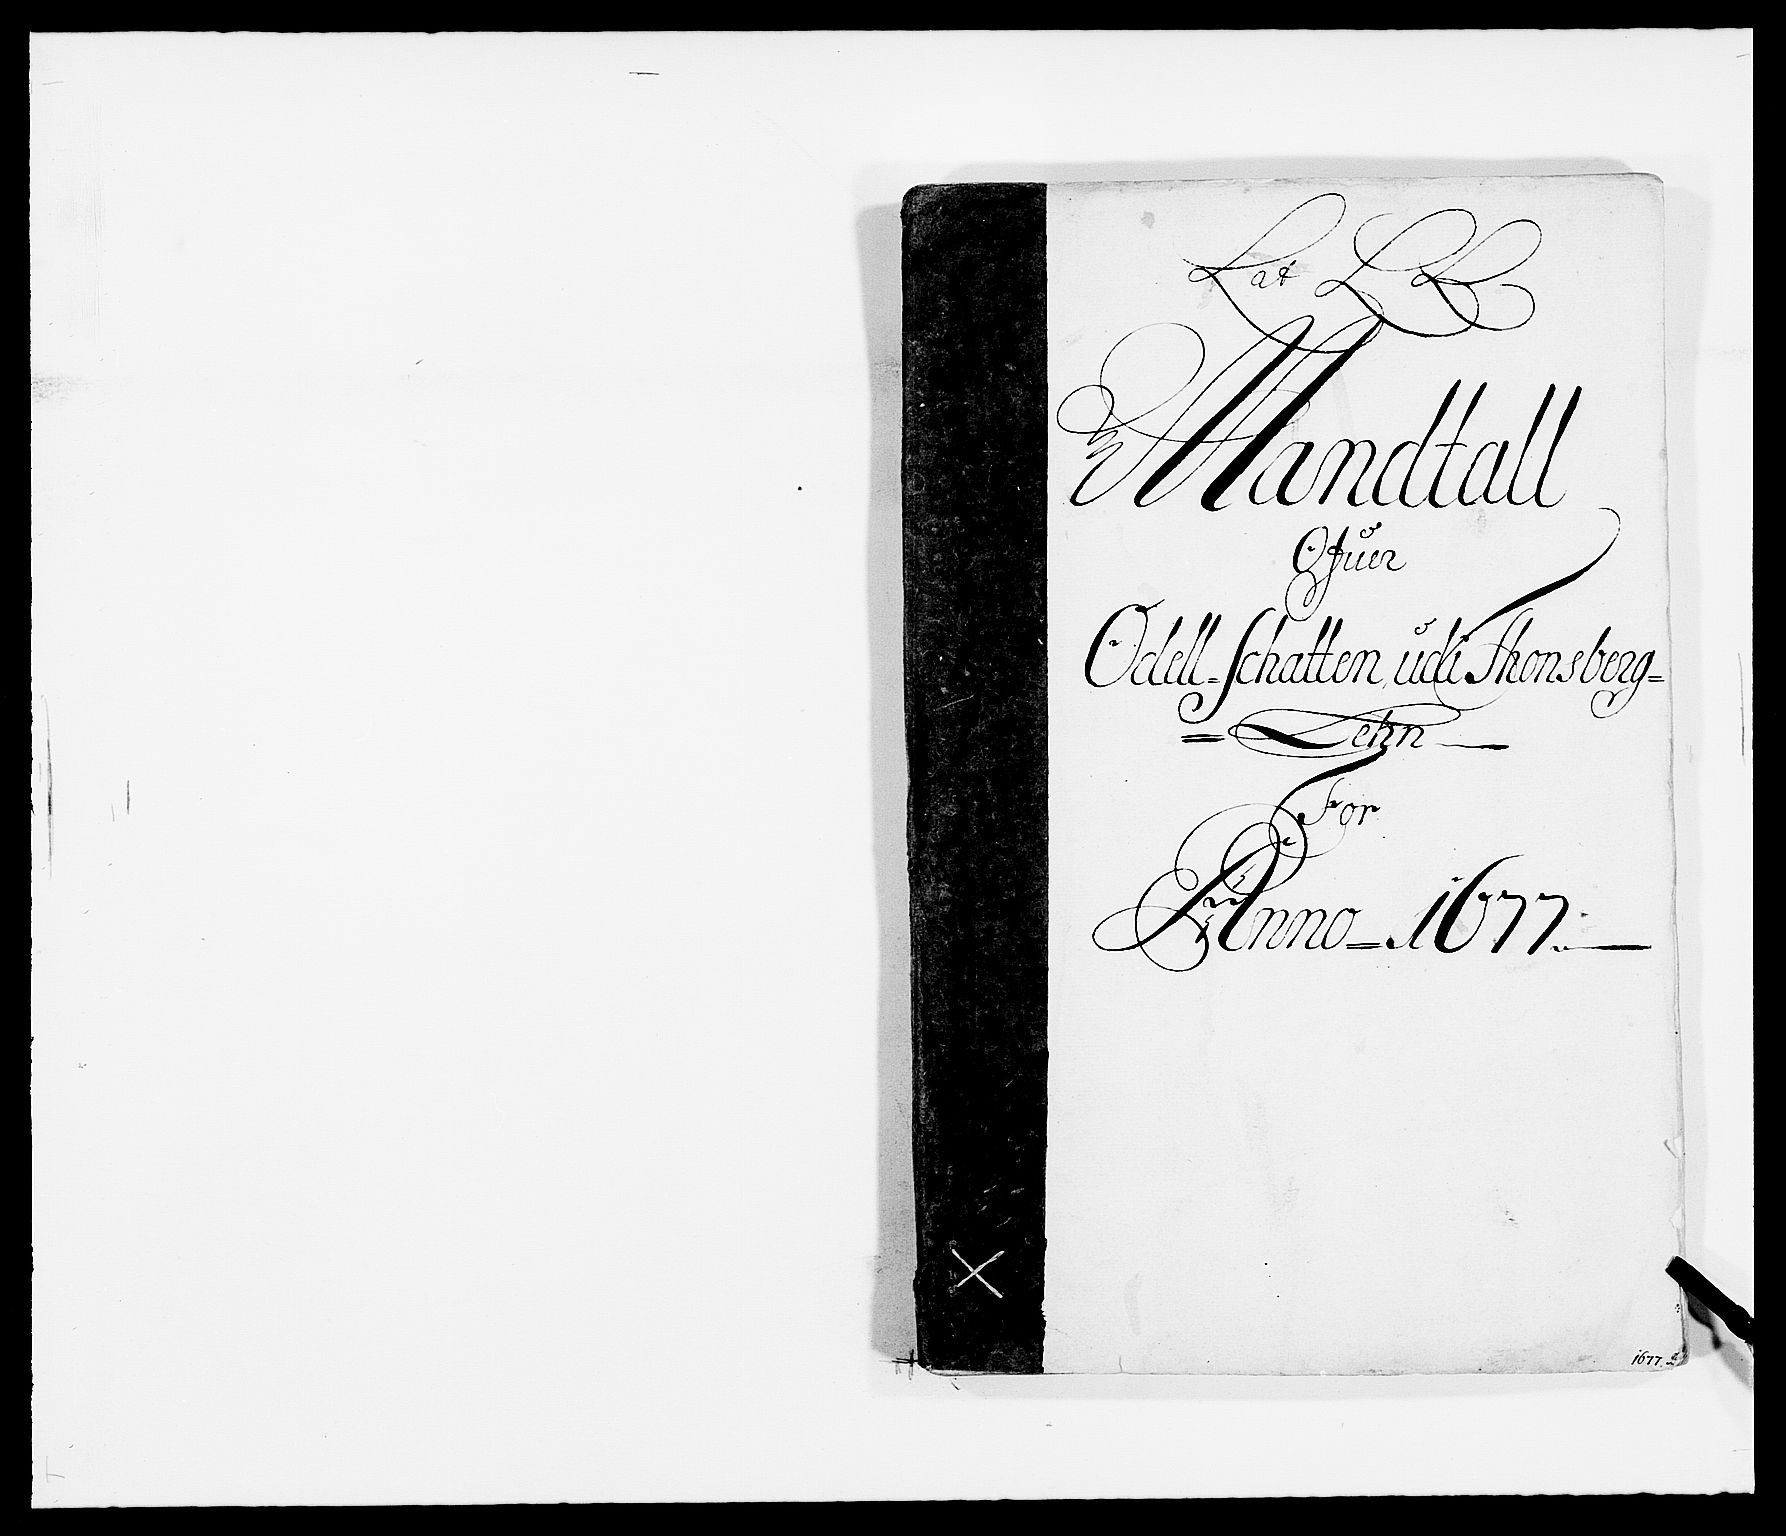 RA, Rentekammeret inntil 1814, Reviderte regnskaper, Fogderegnskap, R32/L1845: Fogderegnskap Jarlsberg grevskap, 1676-1678, s. 251